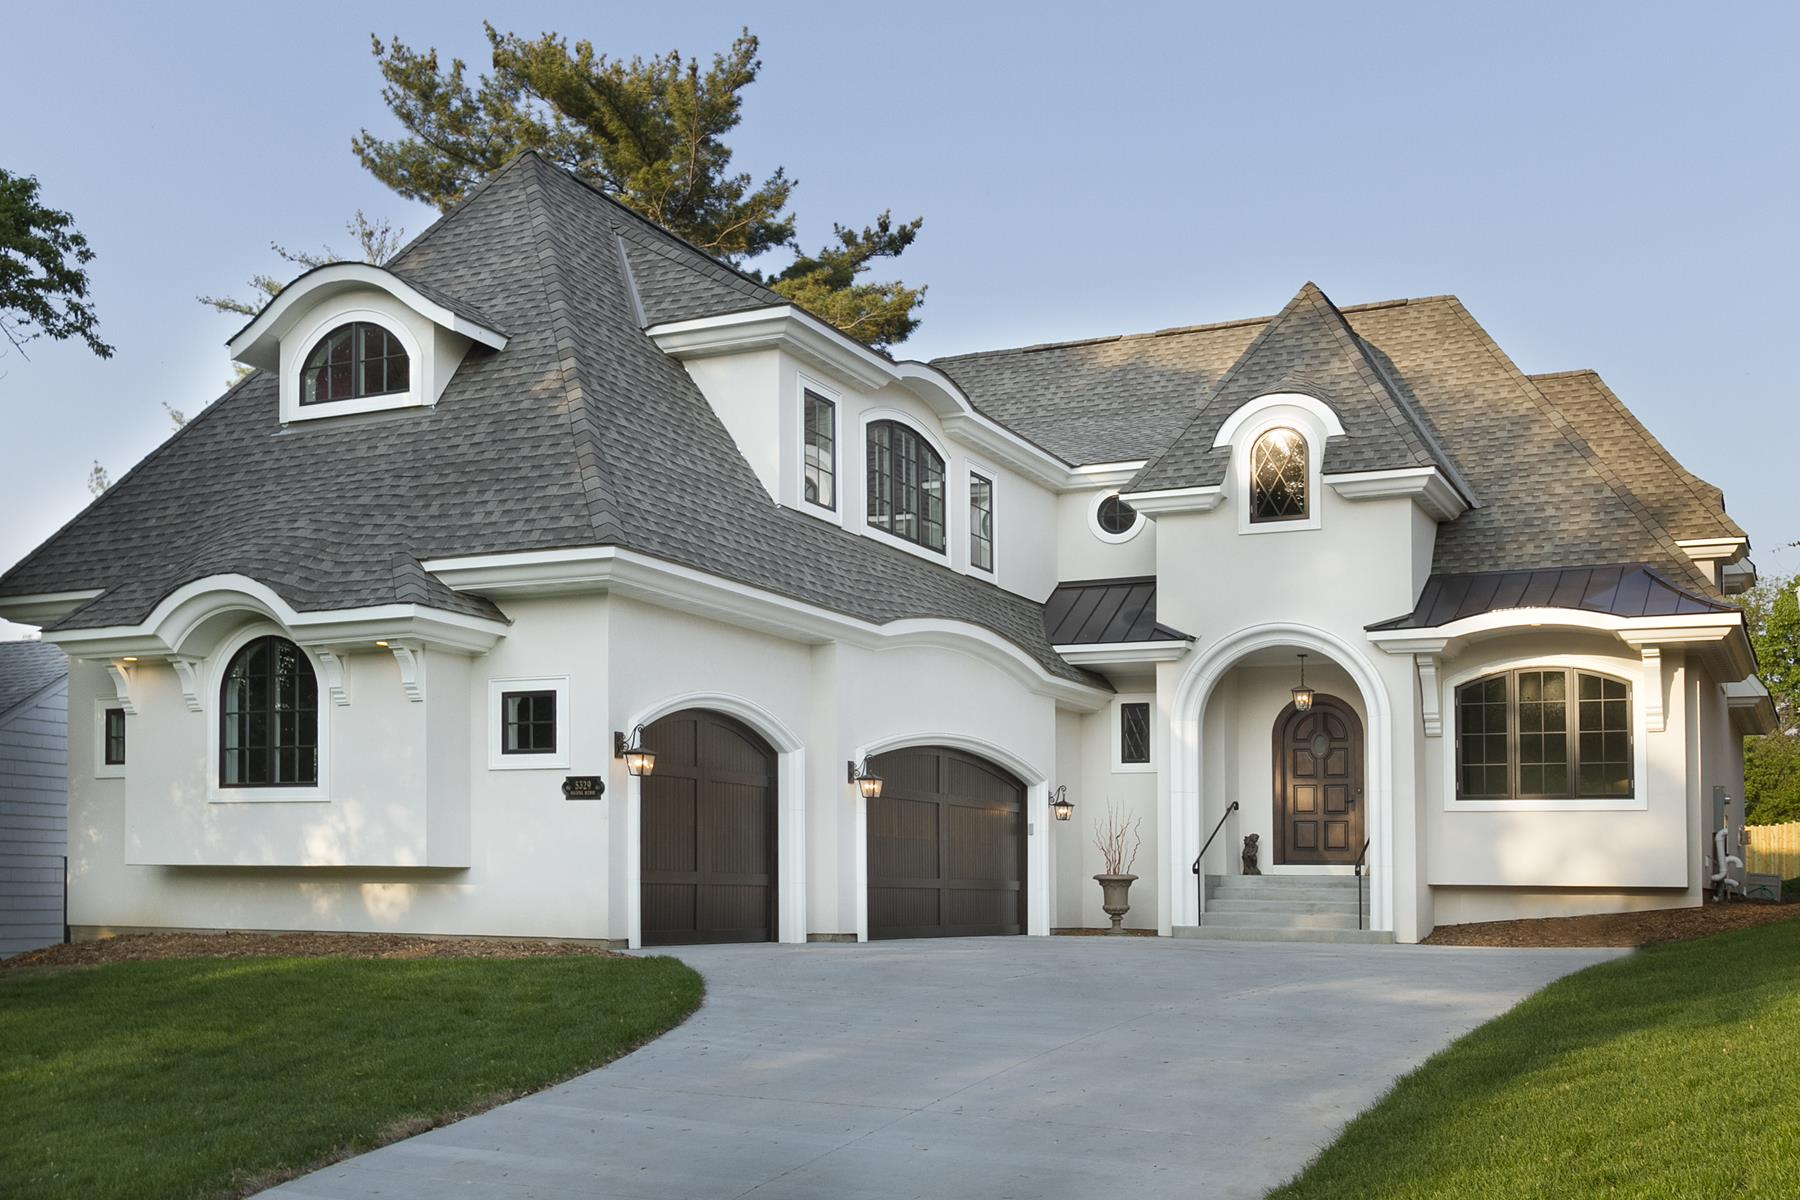 Single Family Home for Sale at 5329 Halifax Avenue S Edina, Minnesota 55424 United States